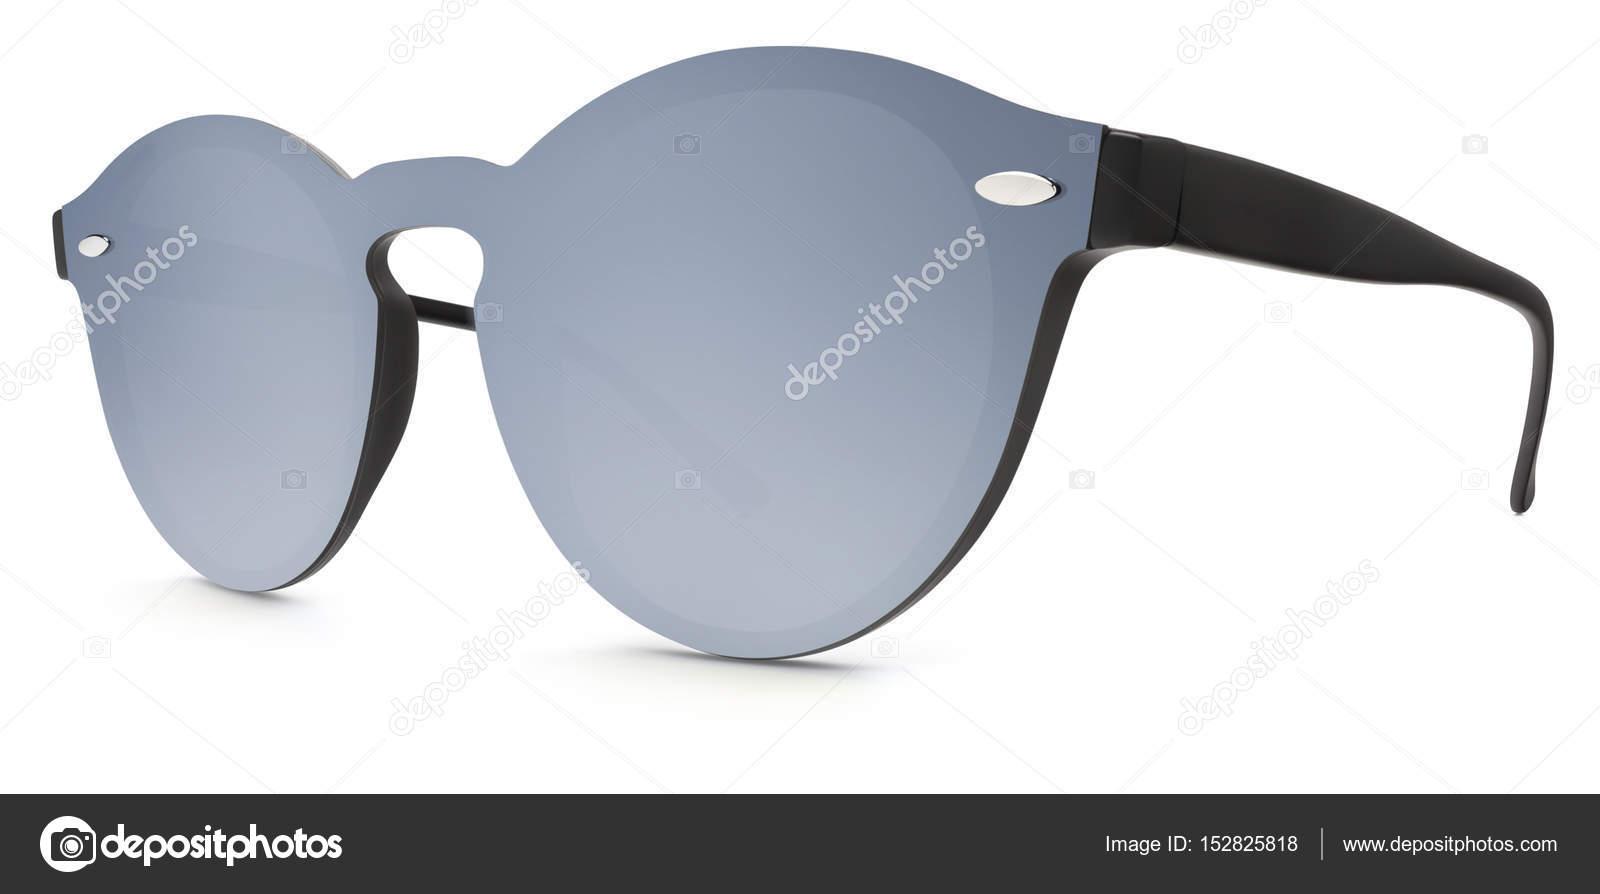 4fb68e8420 Γυαλιά ηλίου γκρι καθρέφτη φακούς που απομονώνονται σε λευκό φόντο– εικόνα  αρχείου